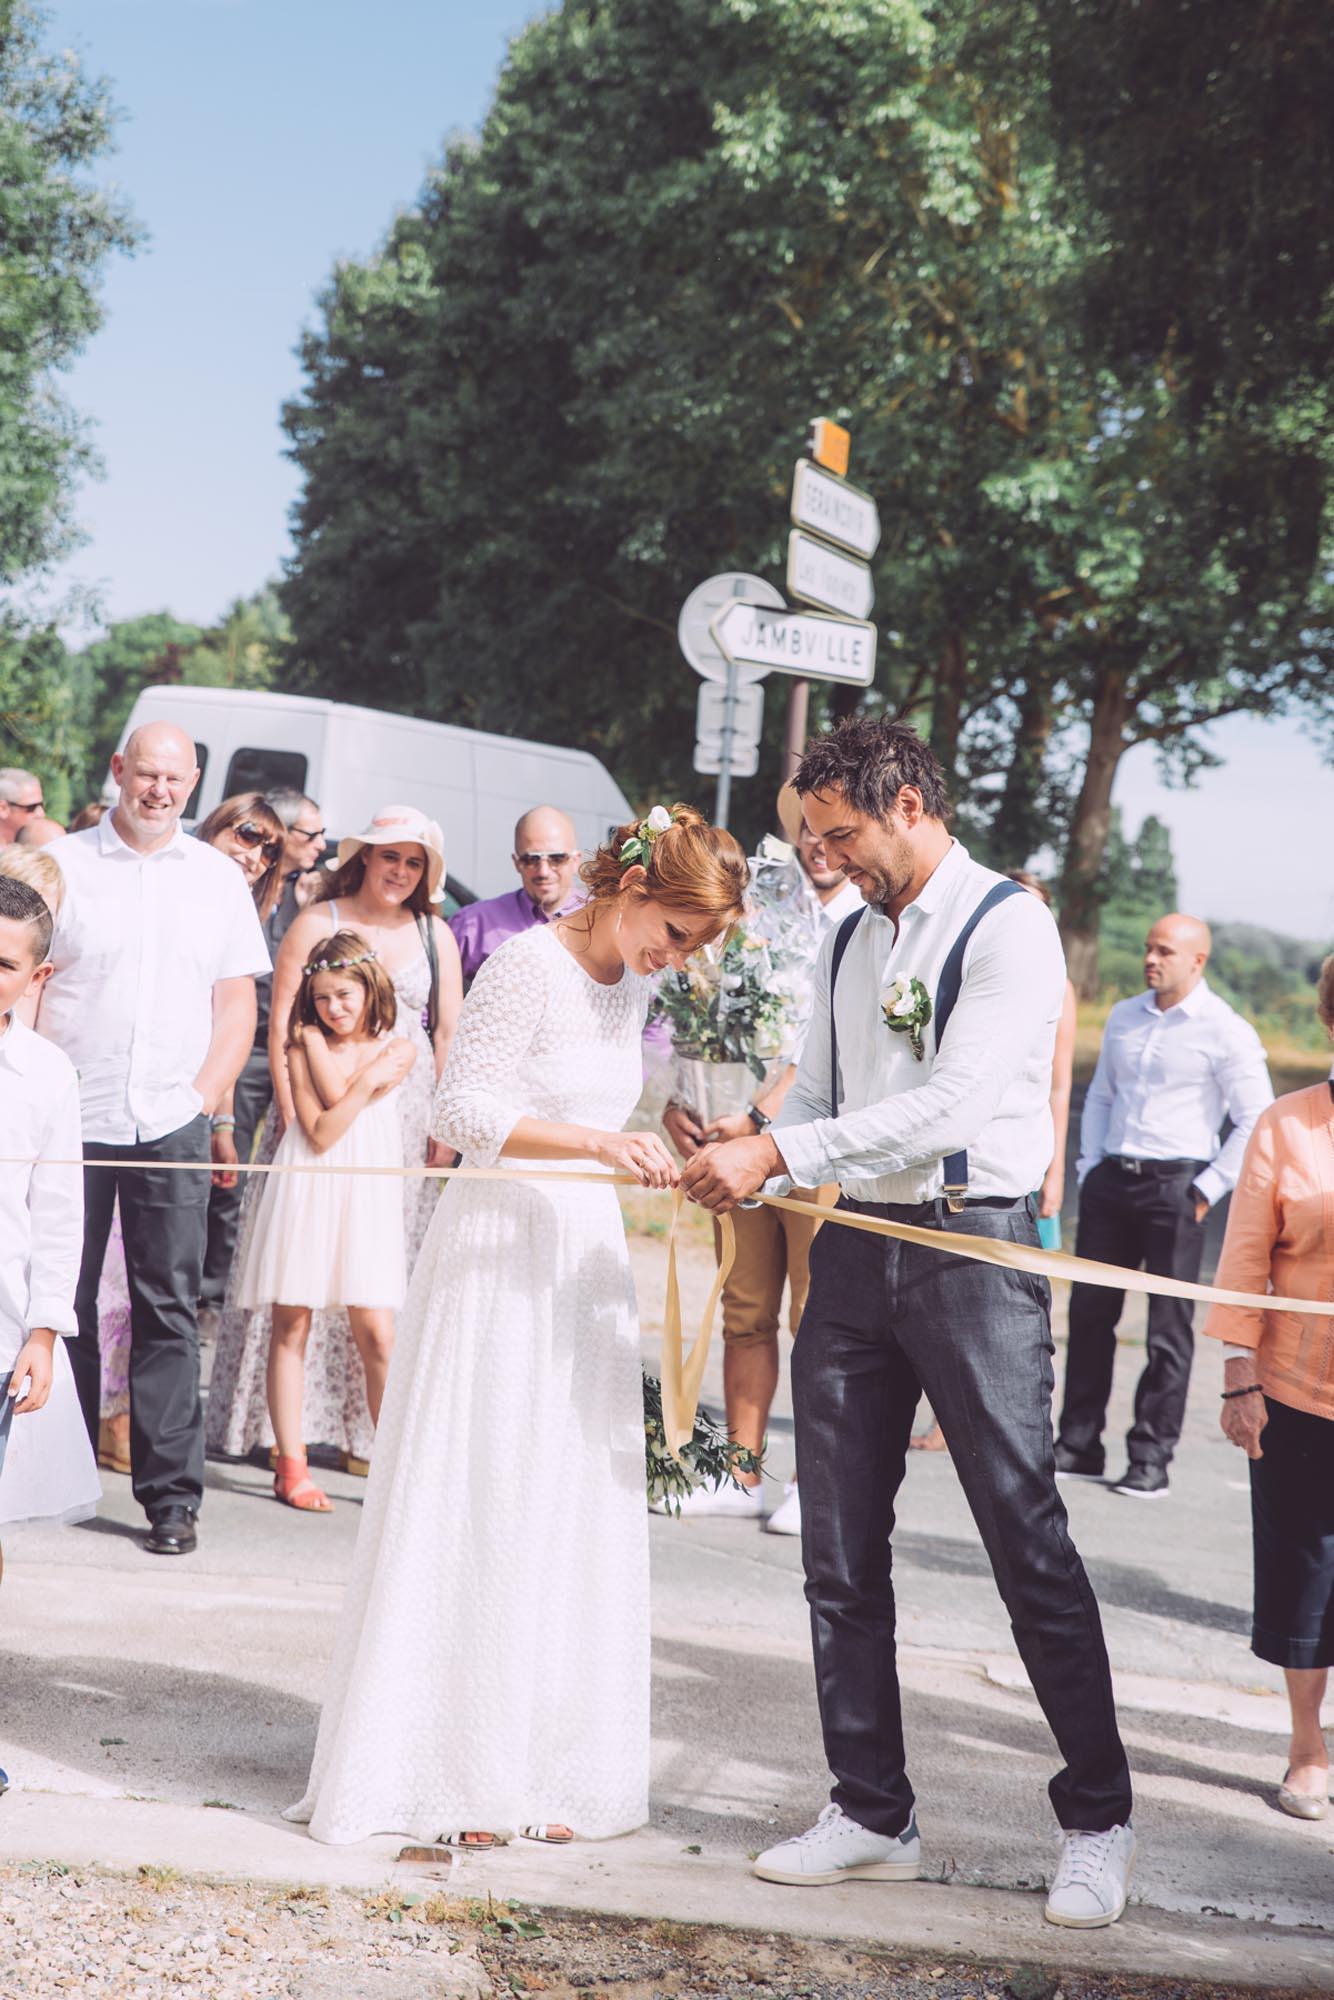 photographe mariage maldeme vexin ecologique